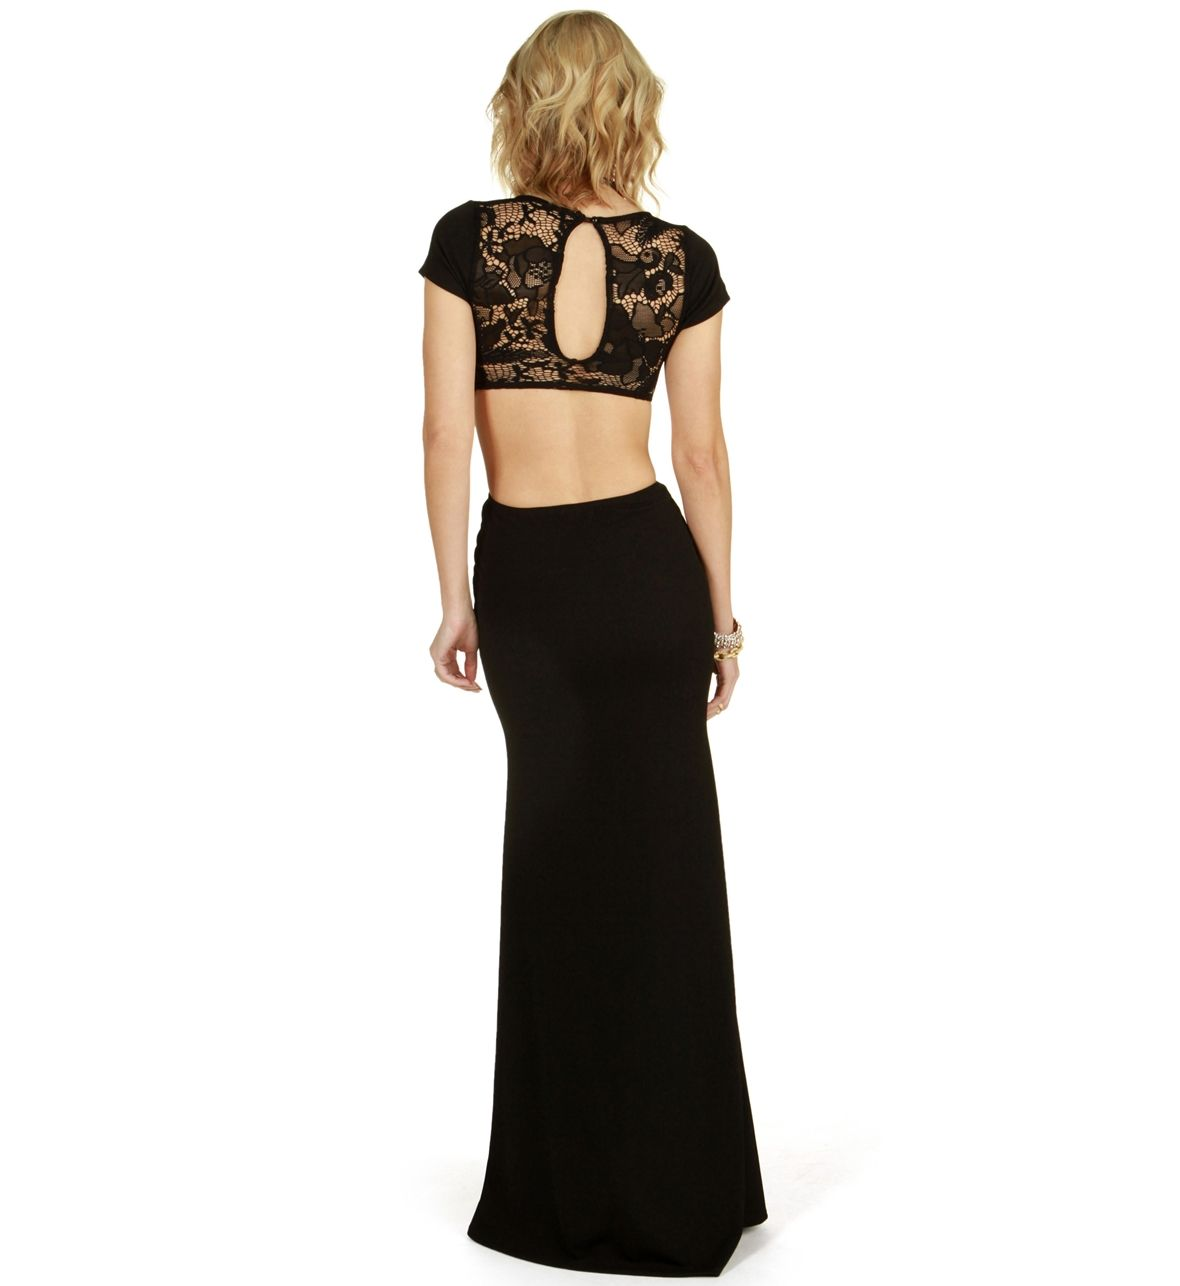 Corinblack prom dress windsor store black prom dress